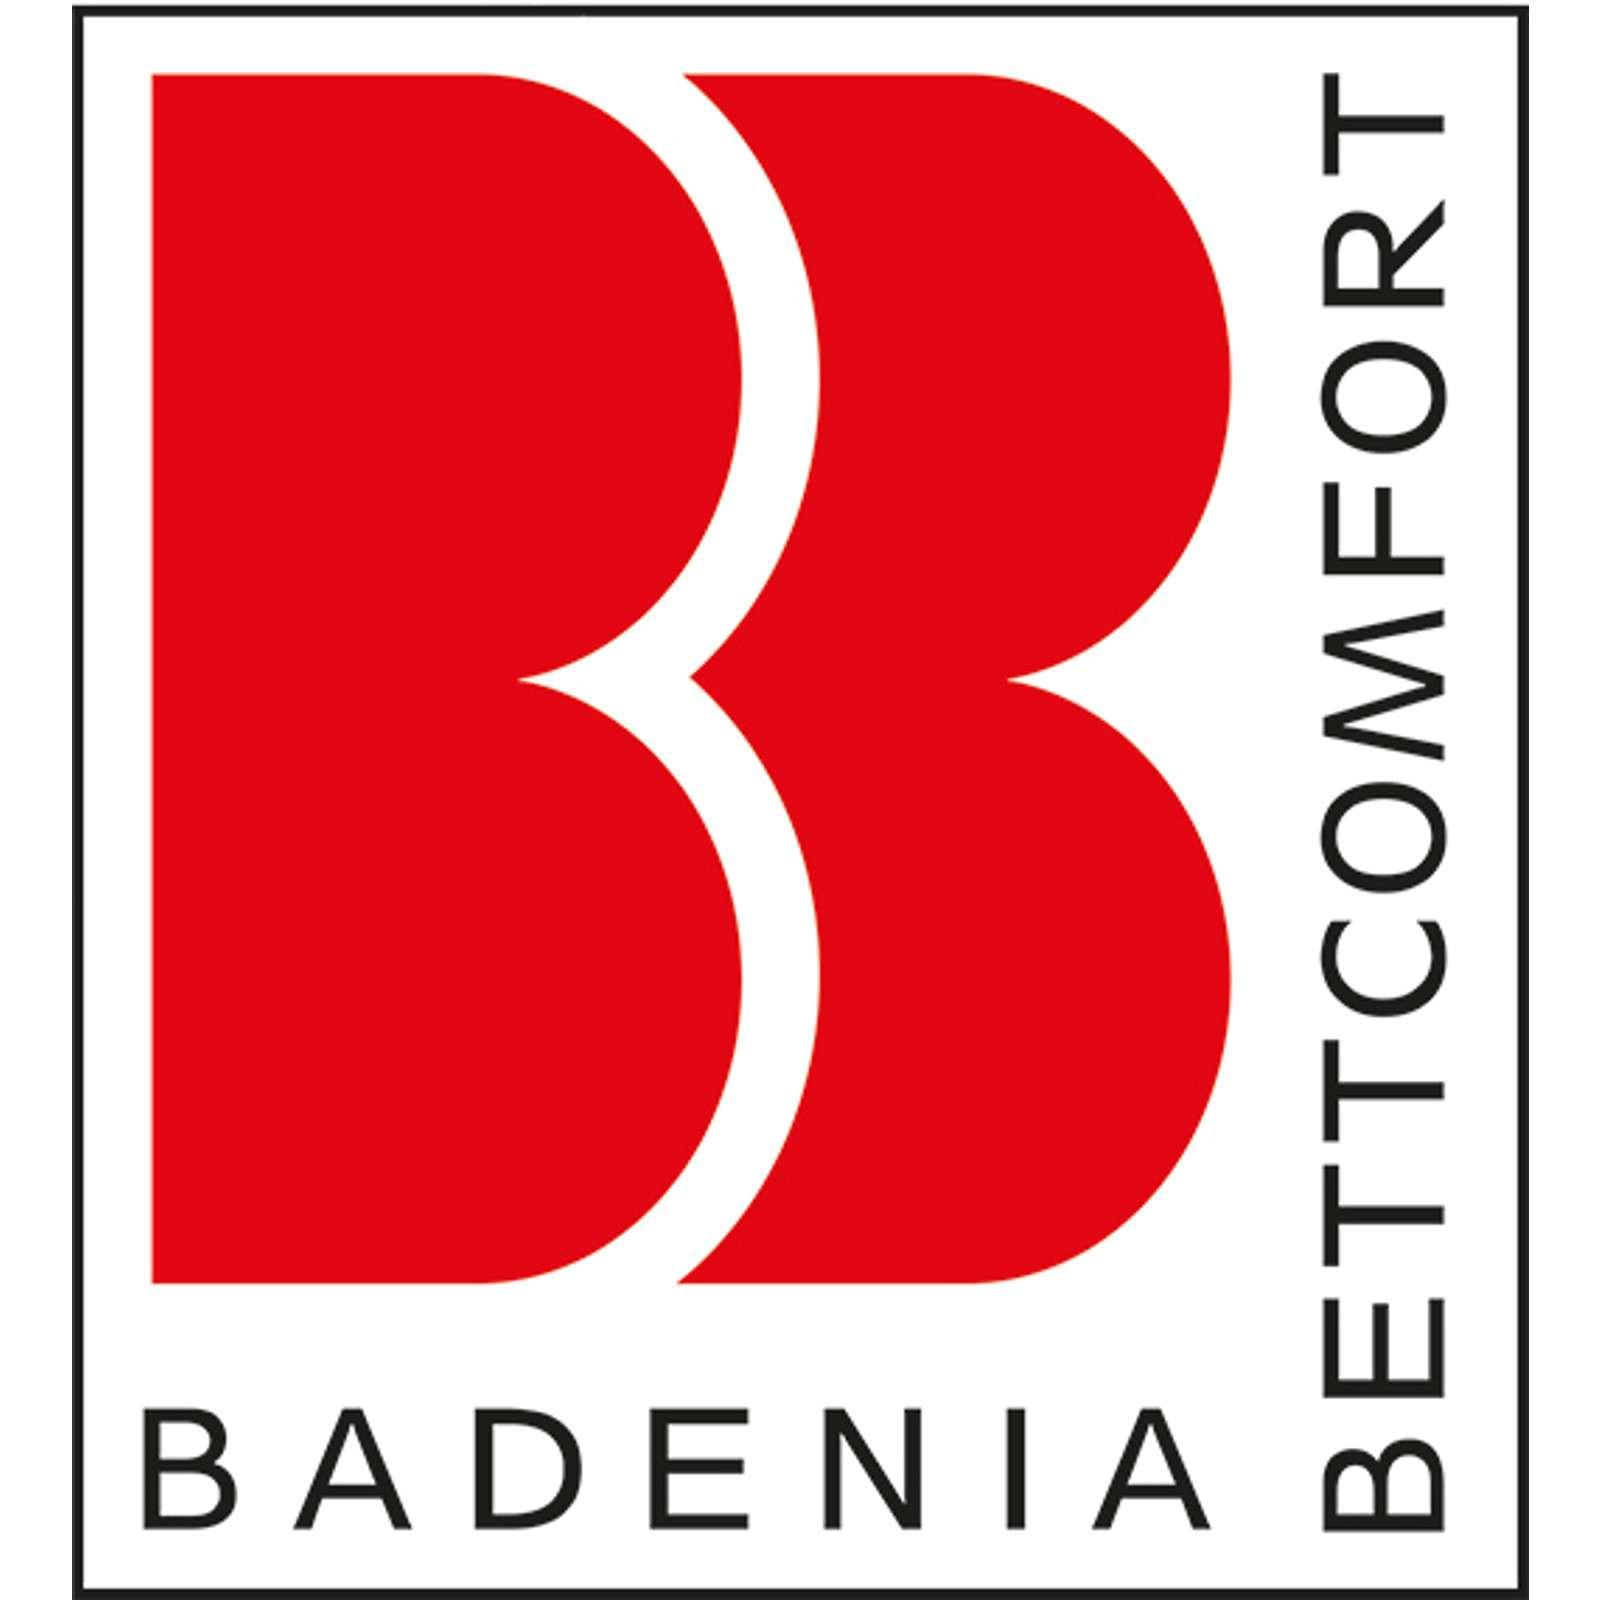 Badenia Irisette